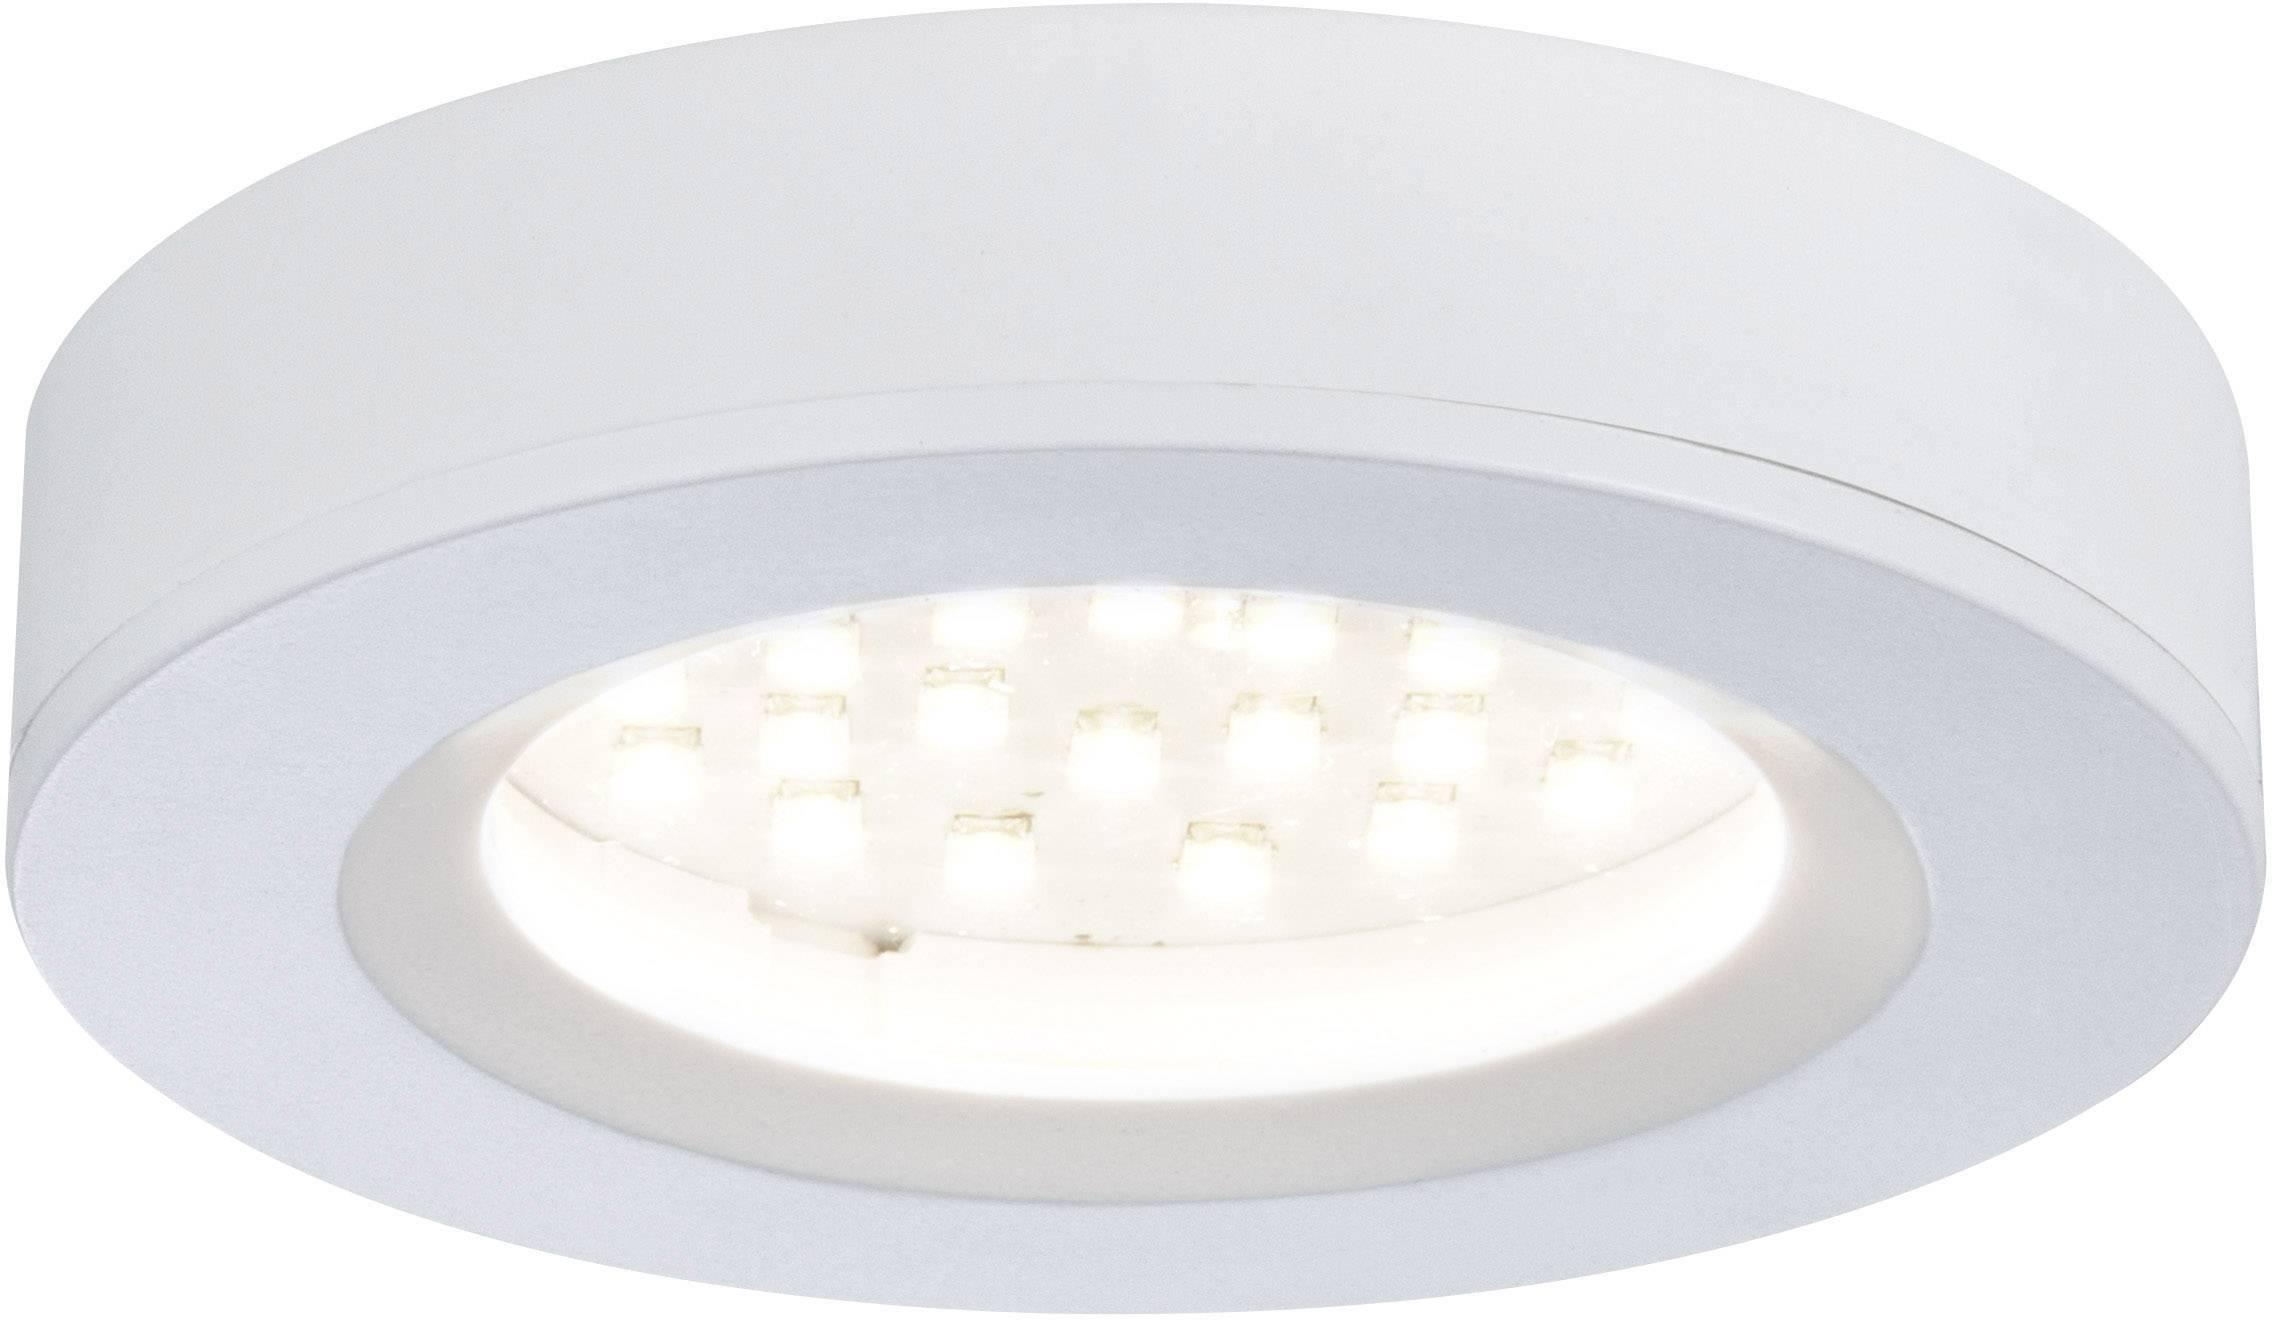 Unika LED-utomhusbelysning tak Paulmann Platy 93573 7.5 W Varmvit Vit UX-59